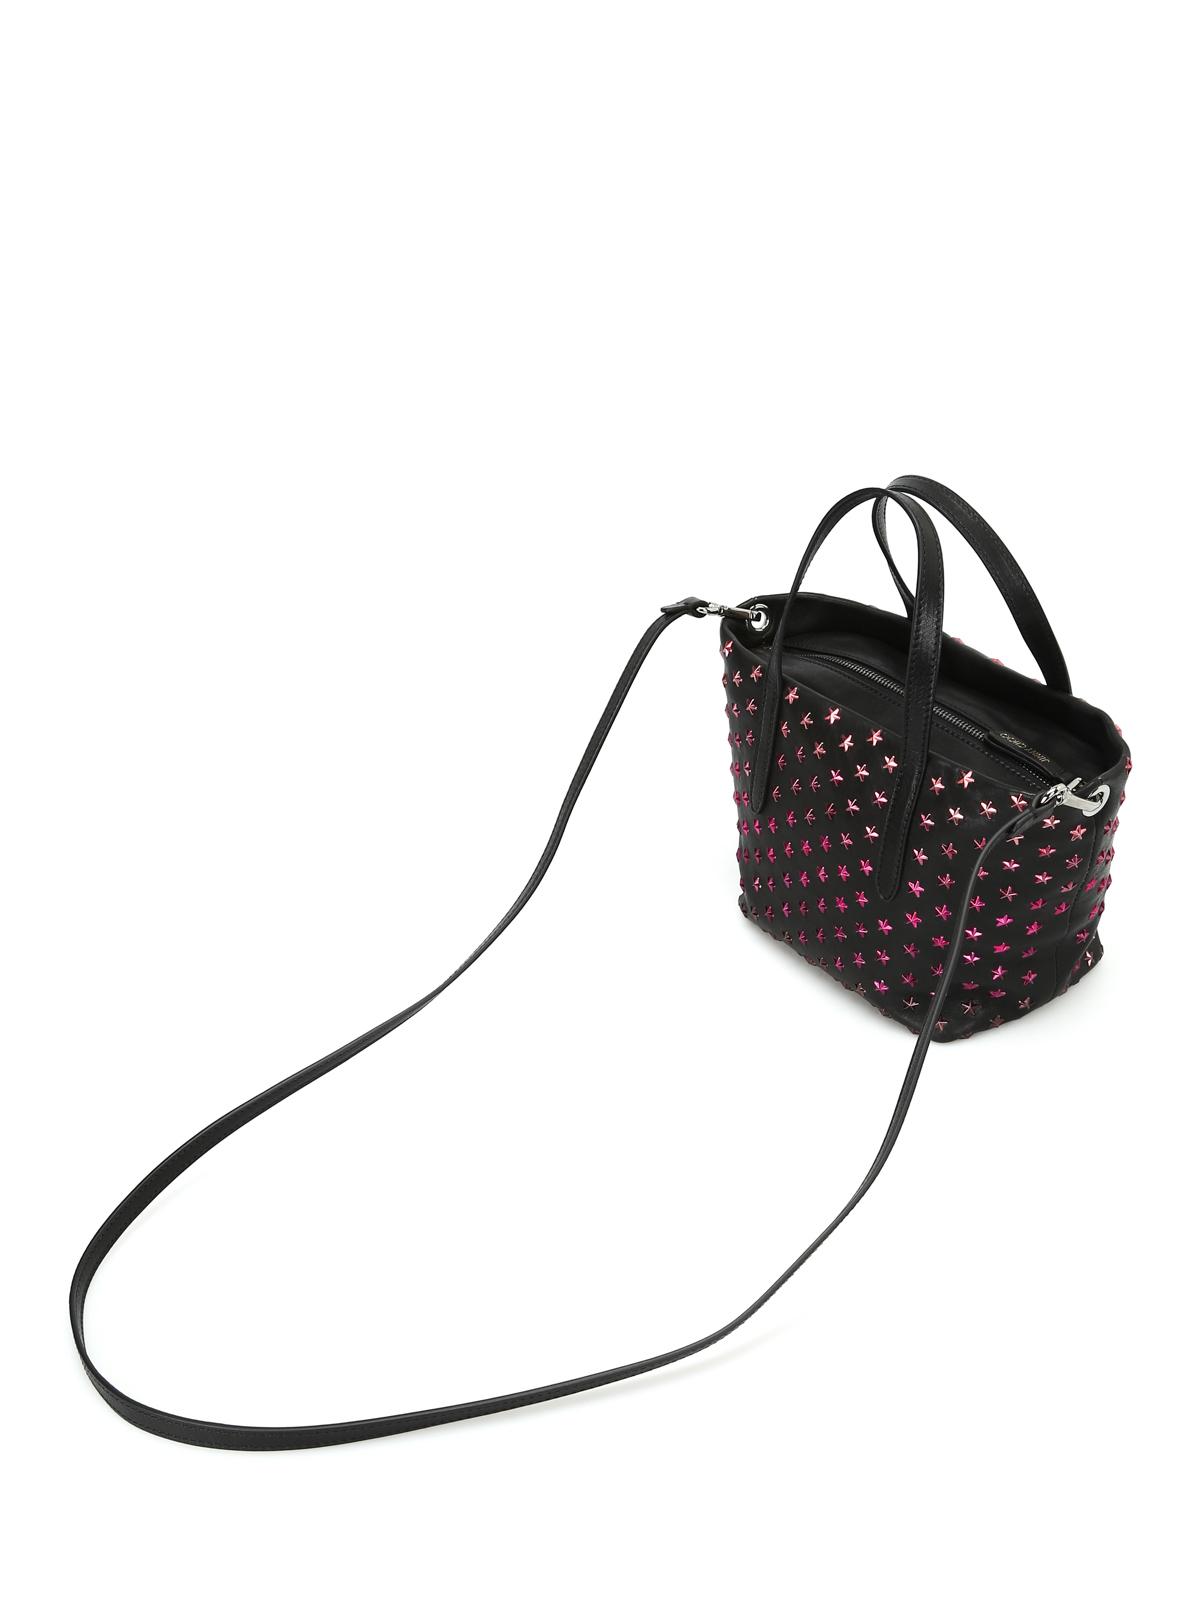 ba11d700412 Jimmy Choo - Mini Sara tote with fuchsia stars - totes bags ...